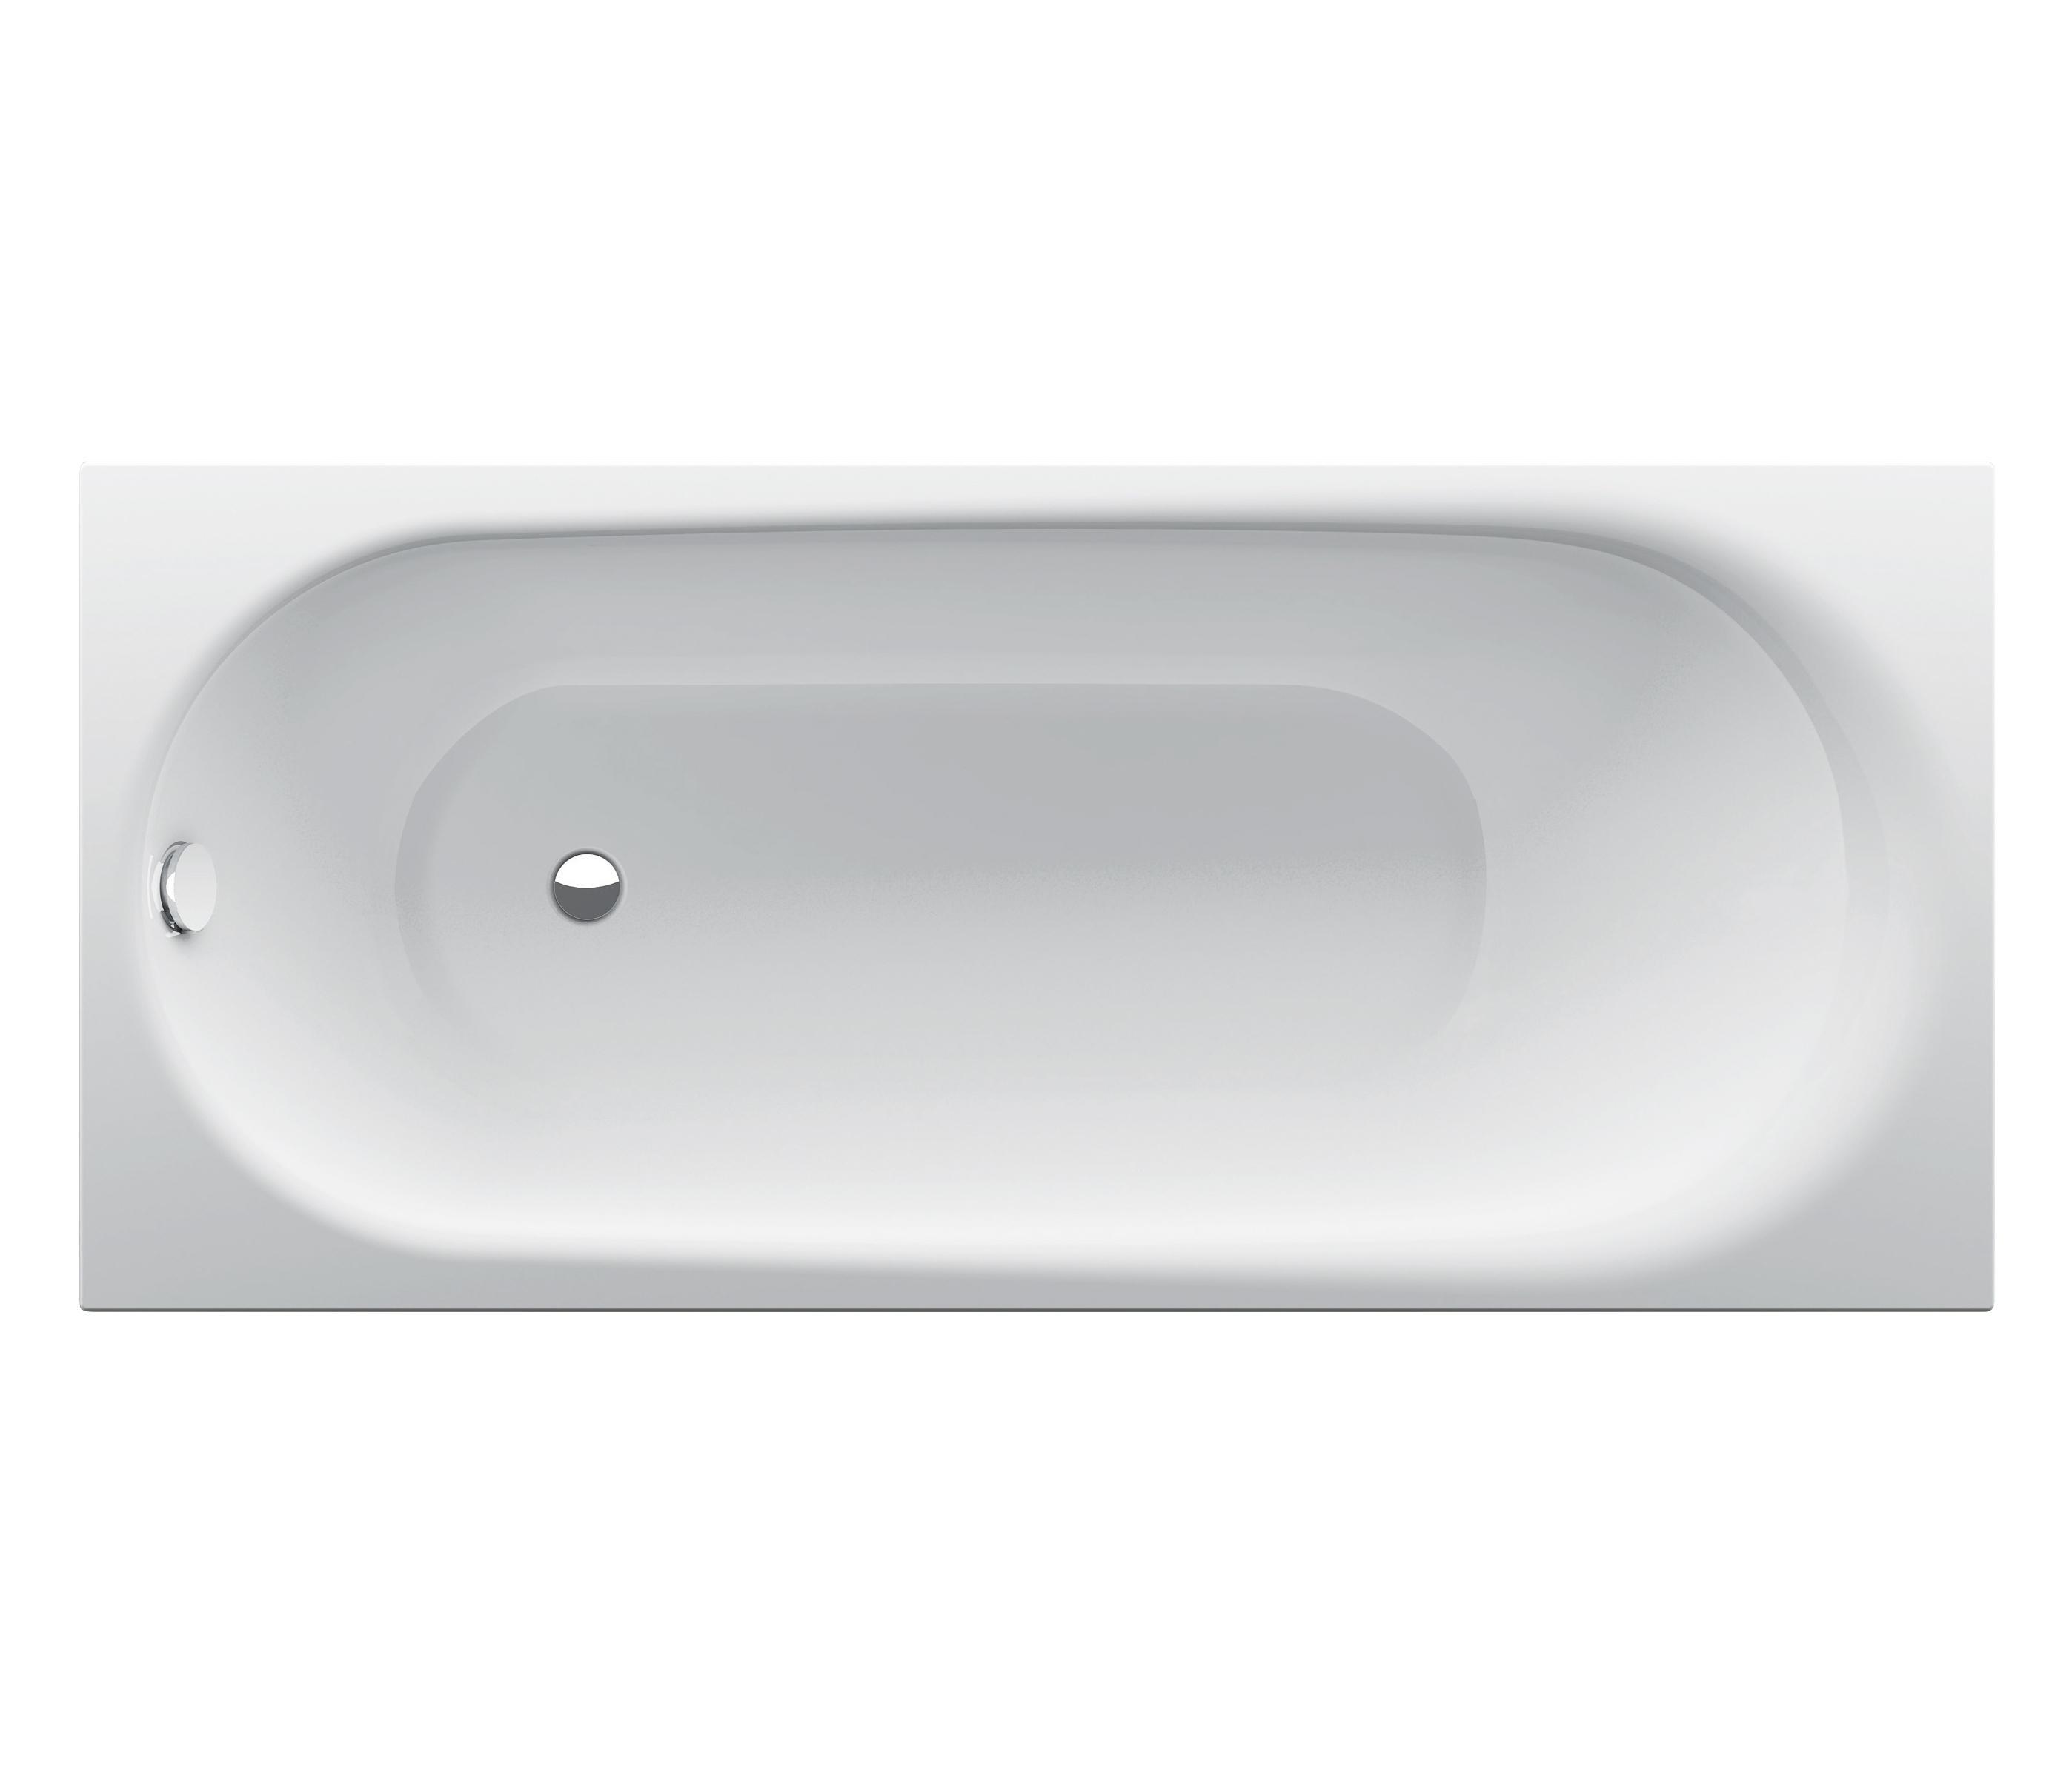 bettecomodo baignoire baignoires encastr es de bette. Black Bedroom Furniture Sets. Home Design Ideas